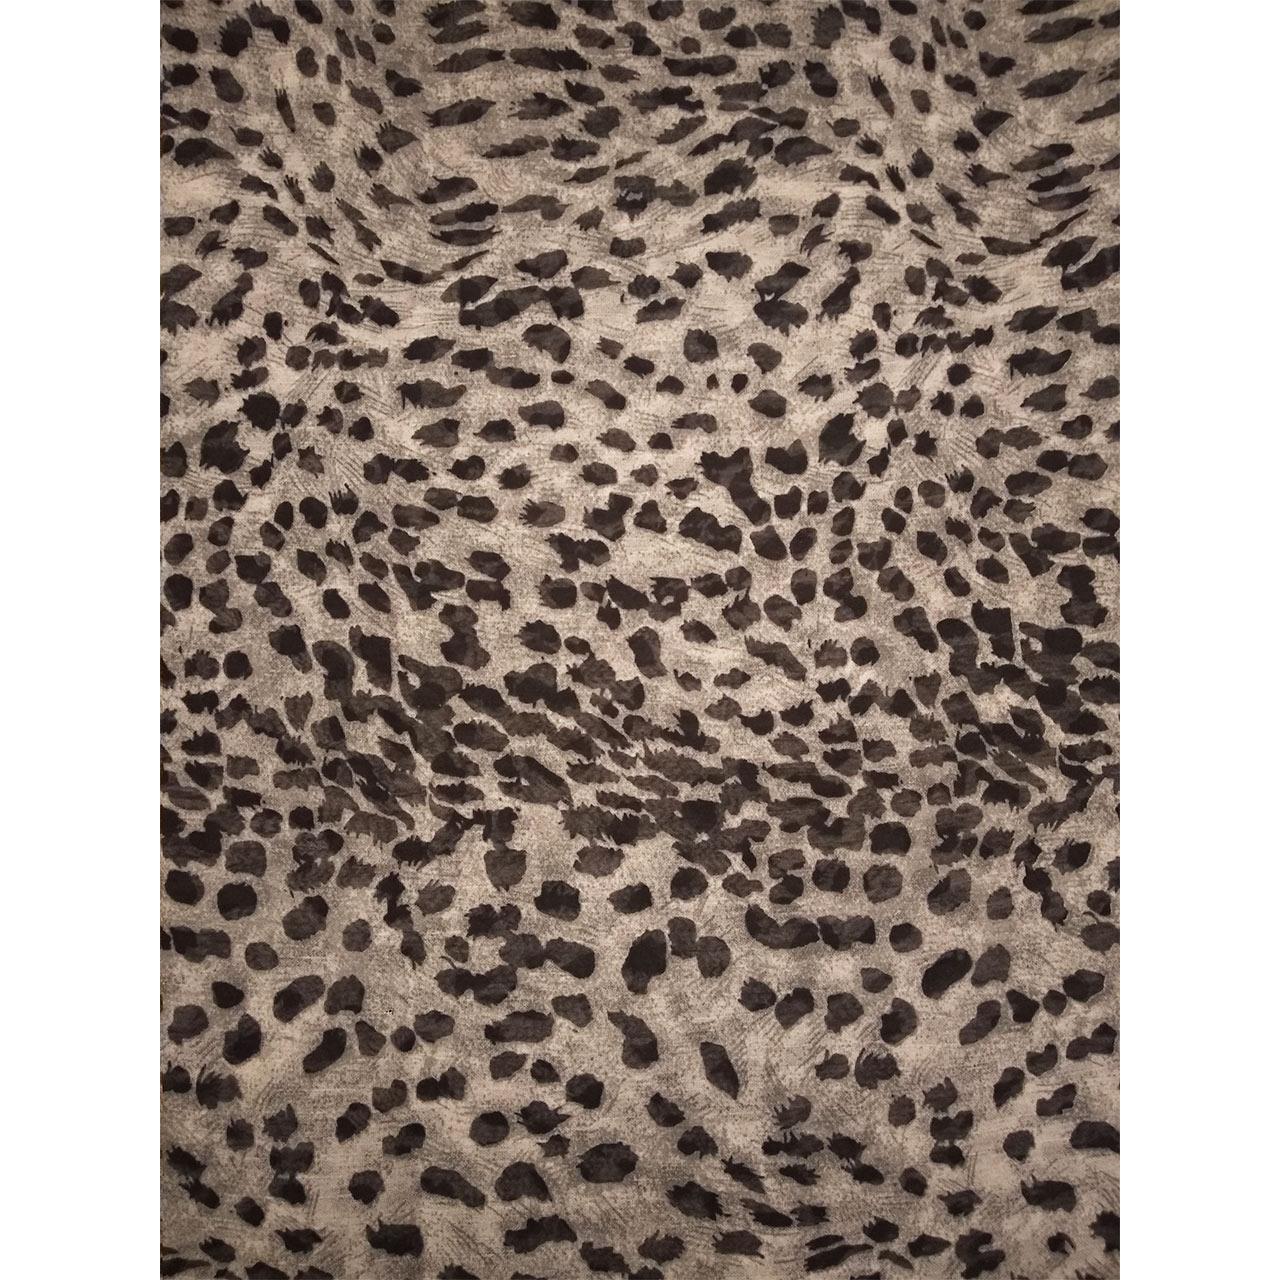 پارچه لباس کد 1044